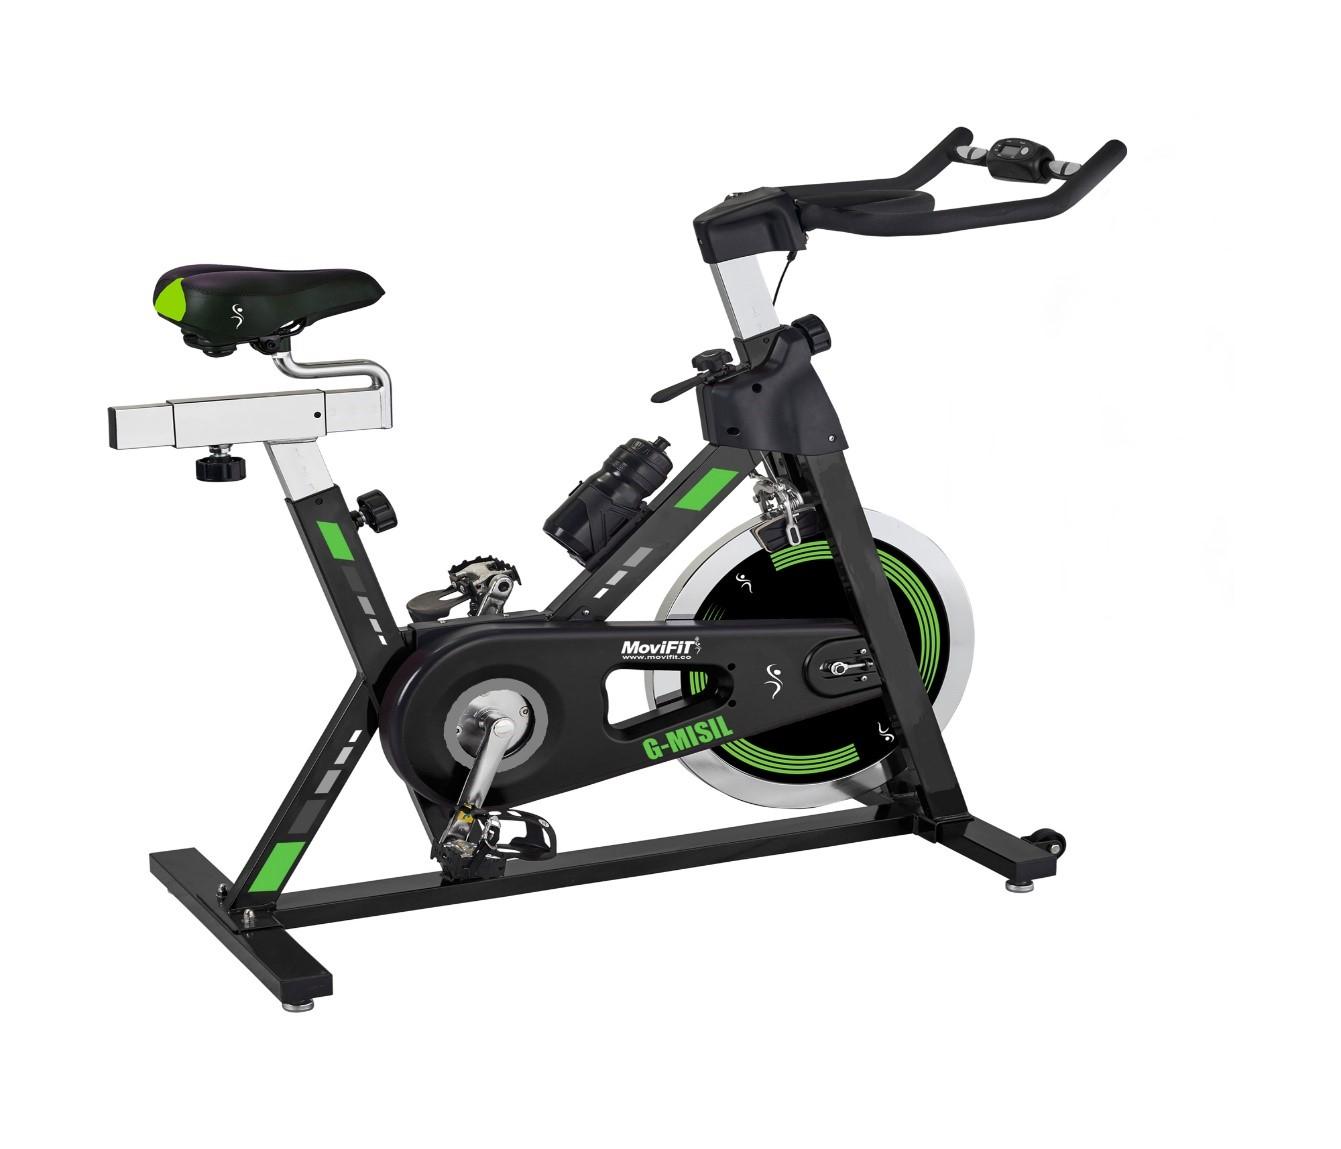 Bicicleta Spinning Movifit G- Misil